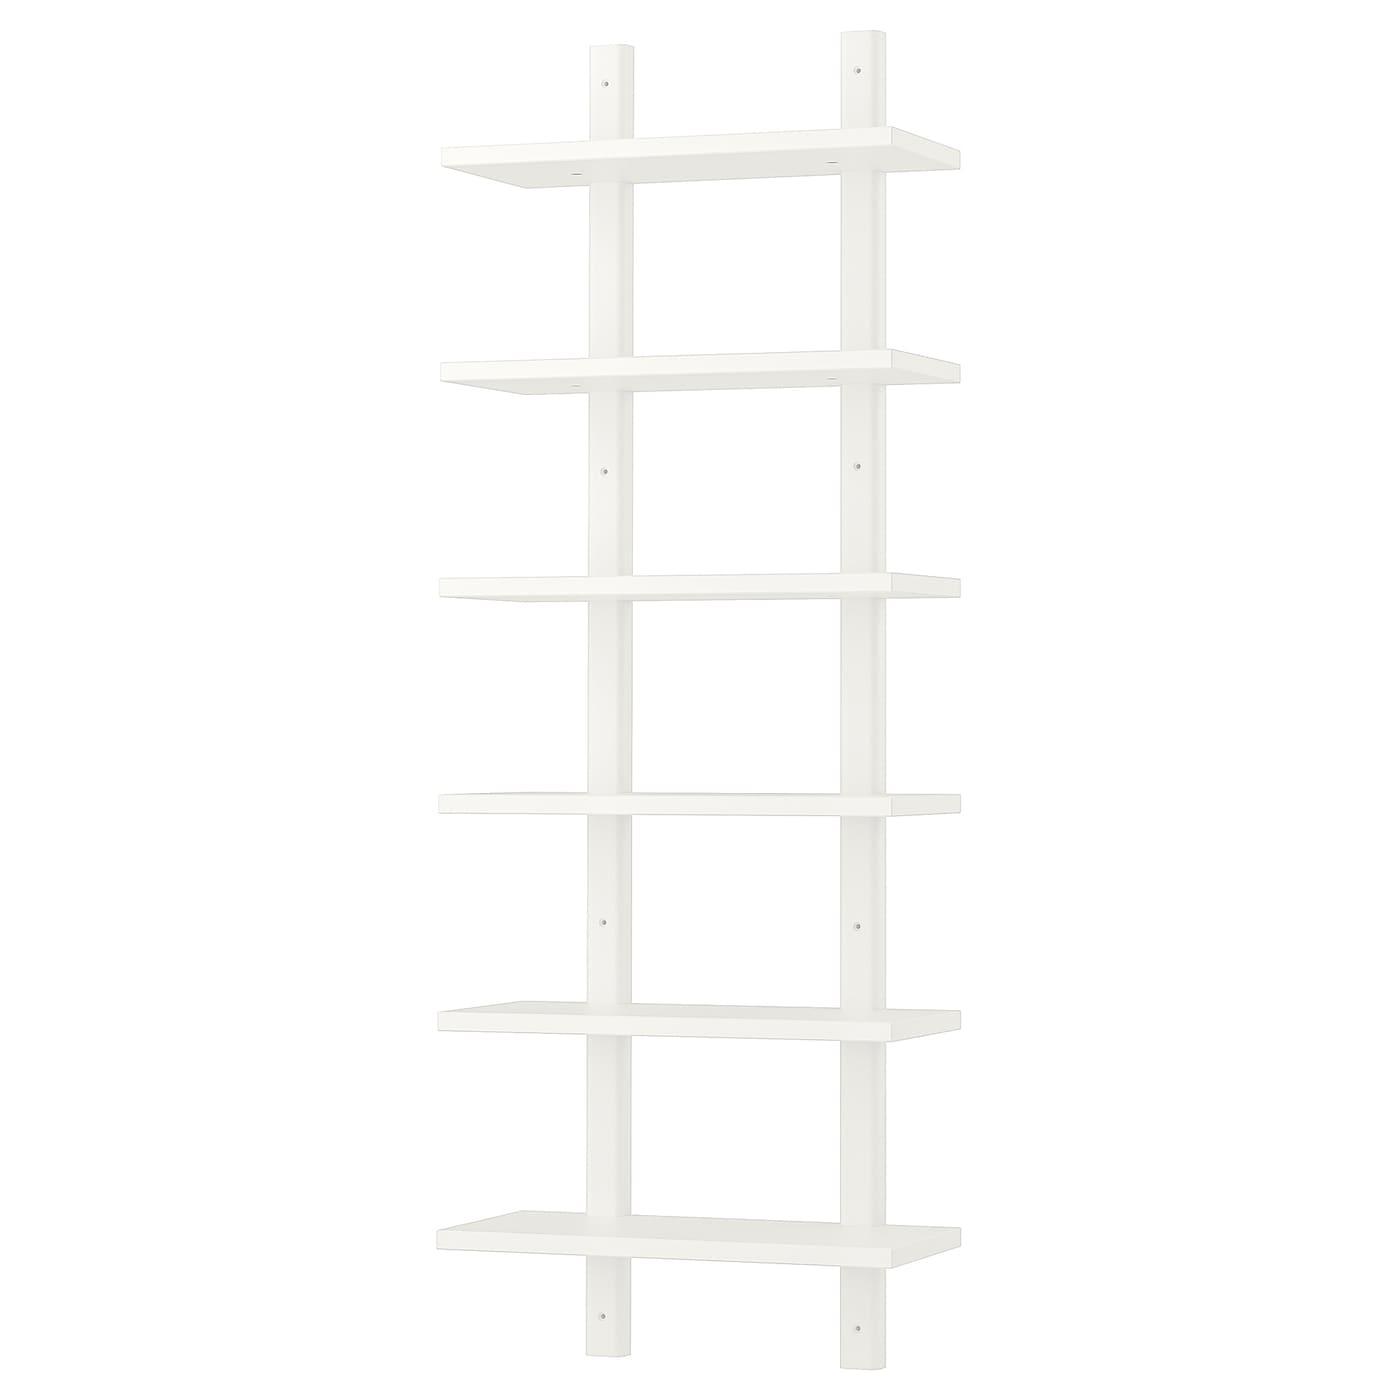 Image of: Varde White Wall Shelf 50×140 Cm Ikea